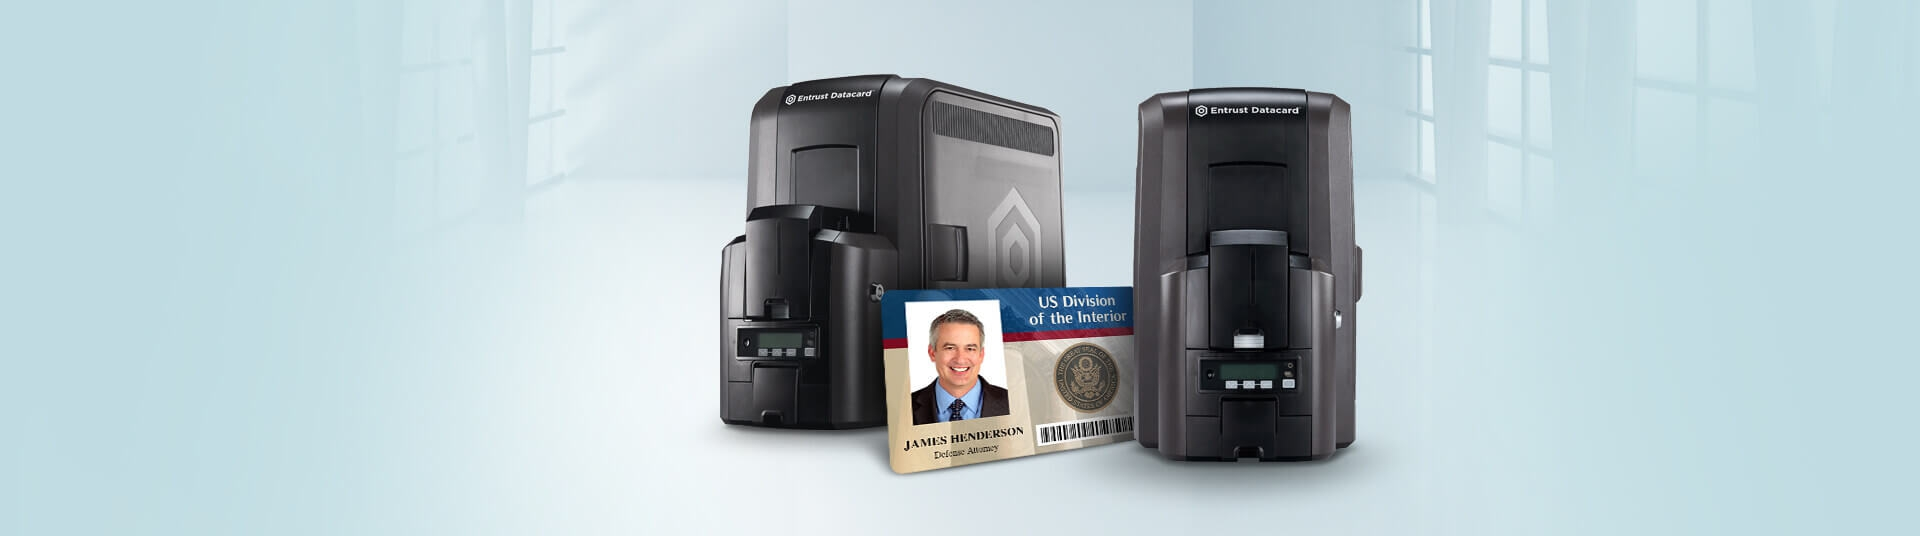 Datacard CR805 ID Card Printers